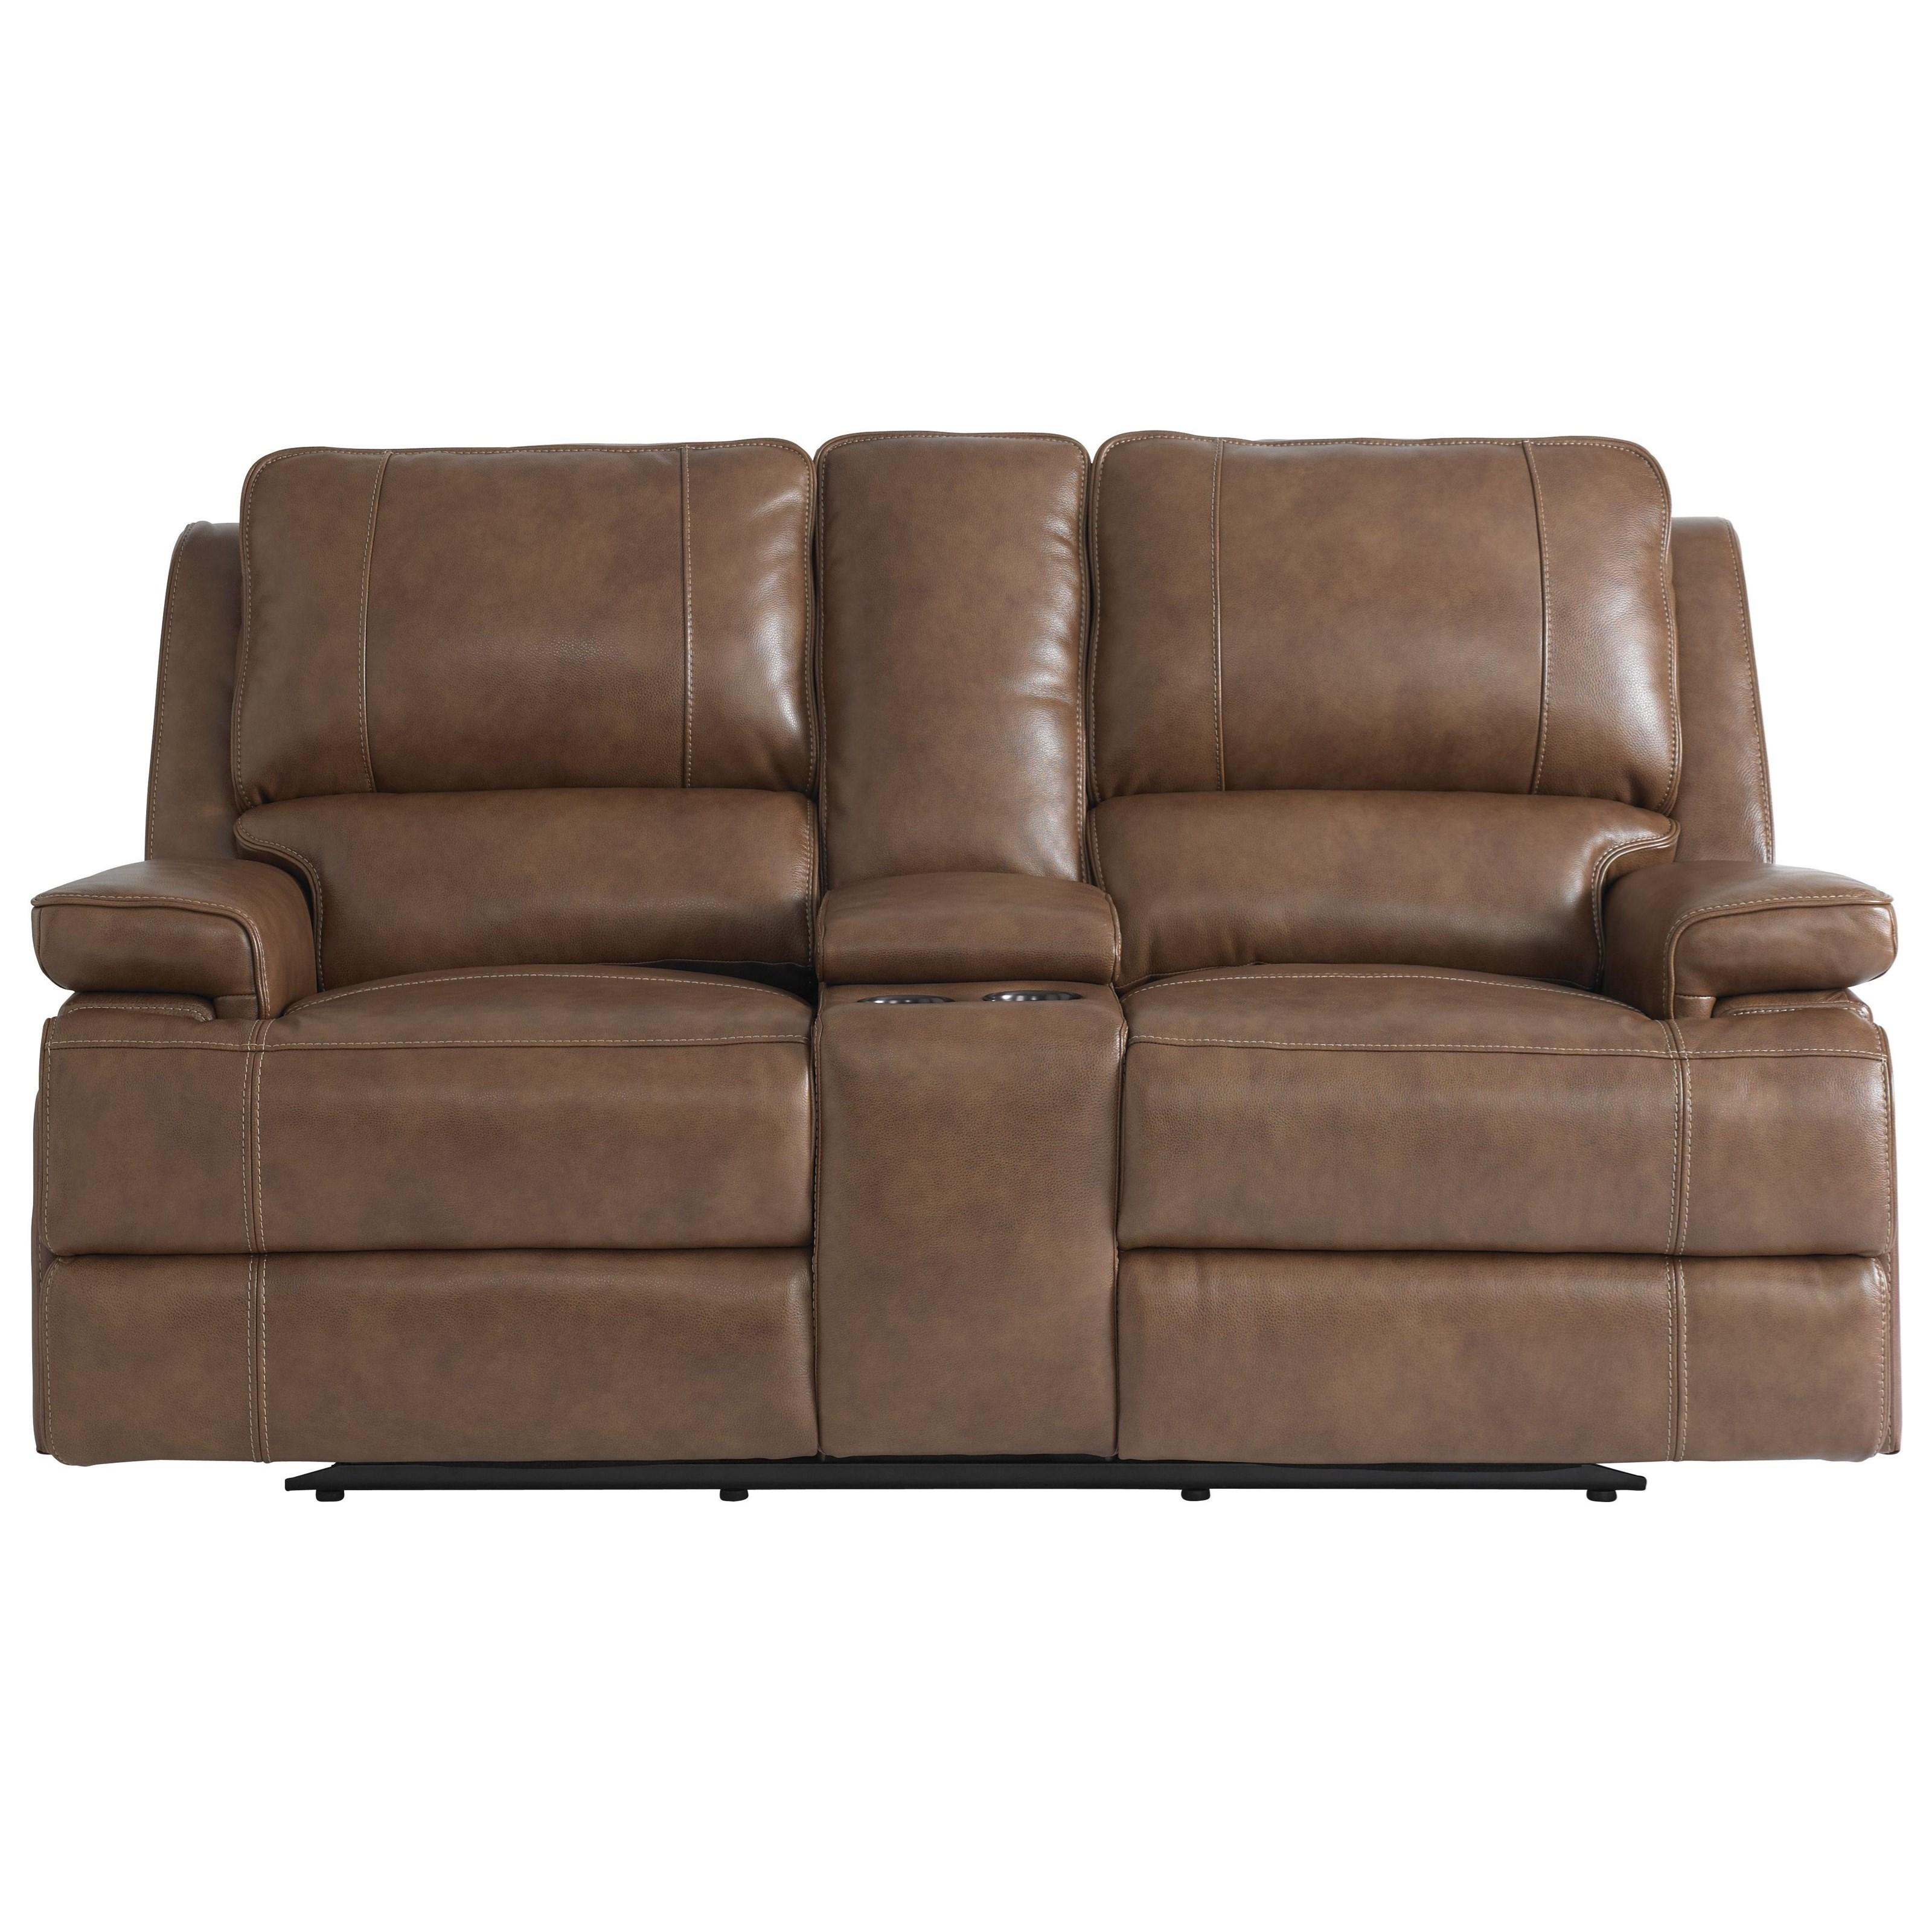 double recliner chairs craftsman rocking chair bassett parker club level 3729 pc42u reclining console loveseat w power headrests